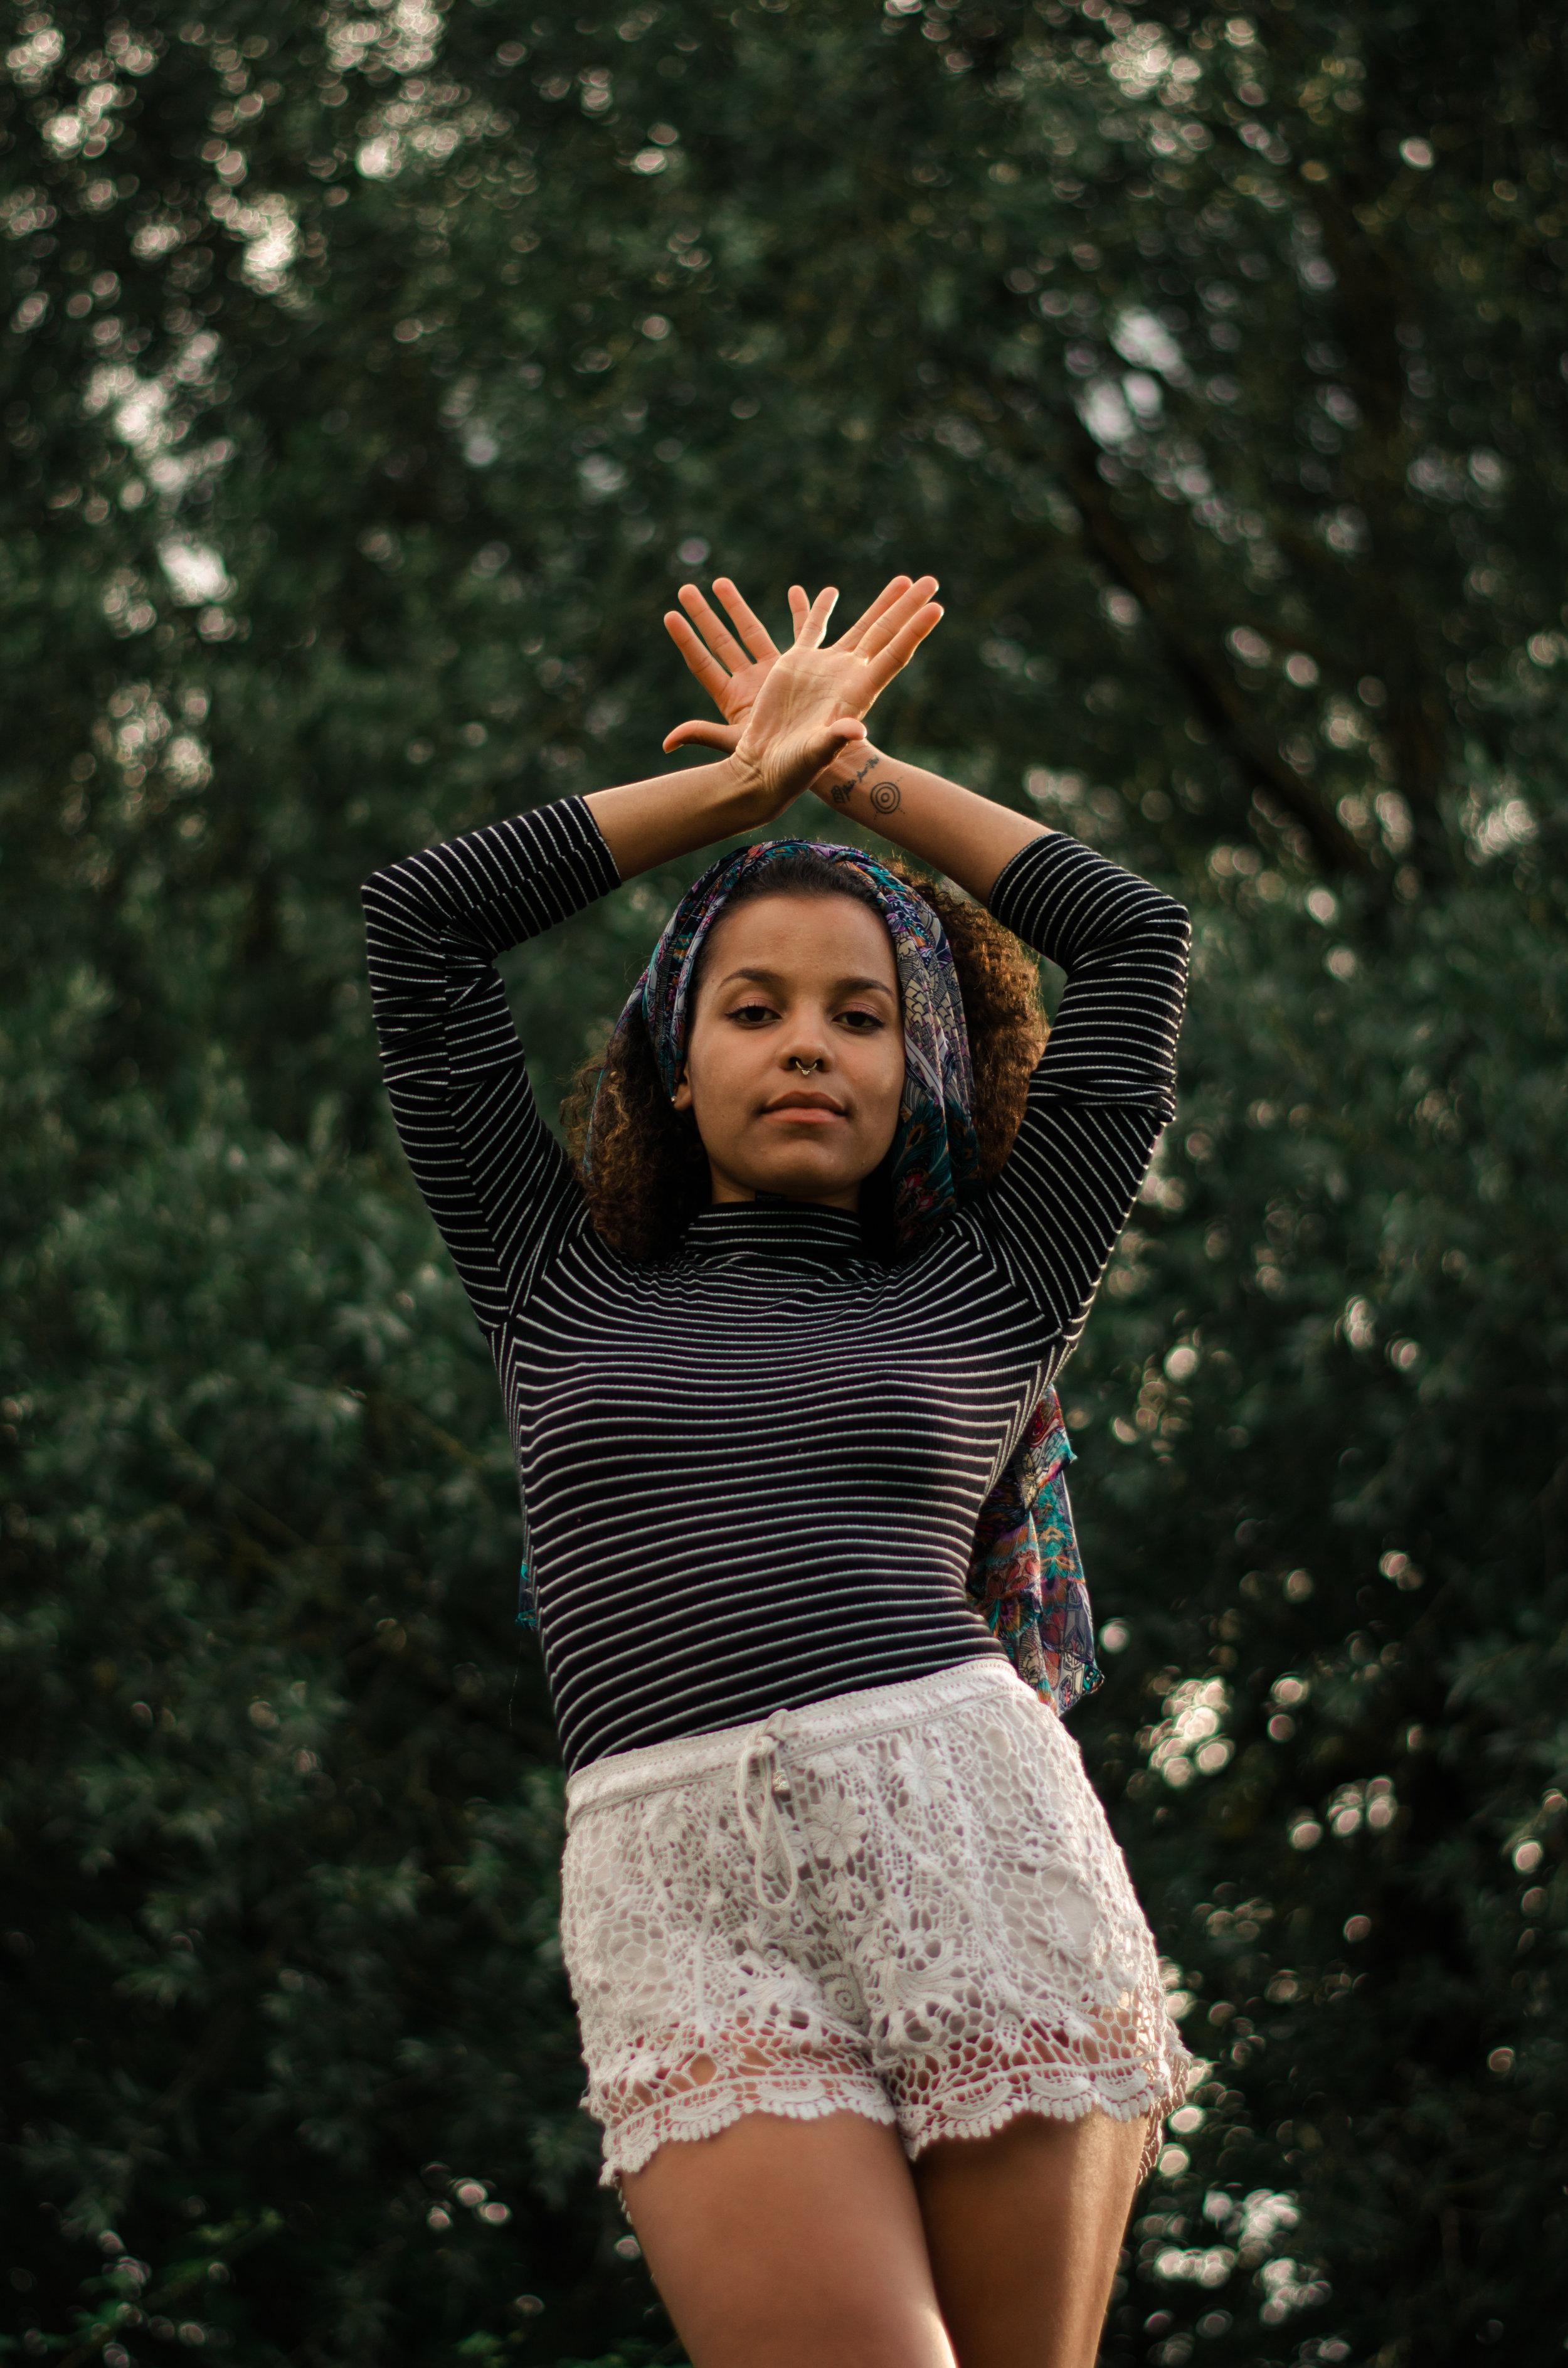 Inka-Portrait-Session-Aiste-Saulyte-Photography-17-07-30-276.jpg